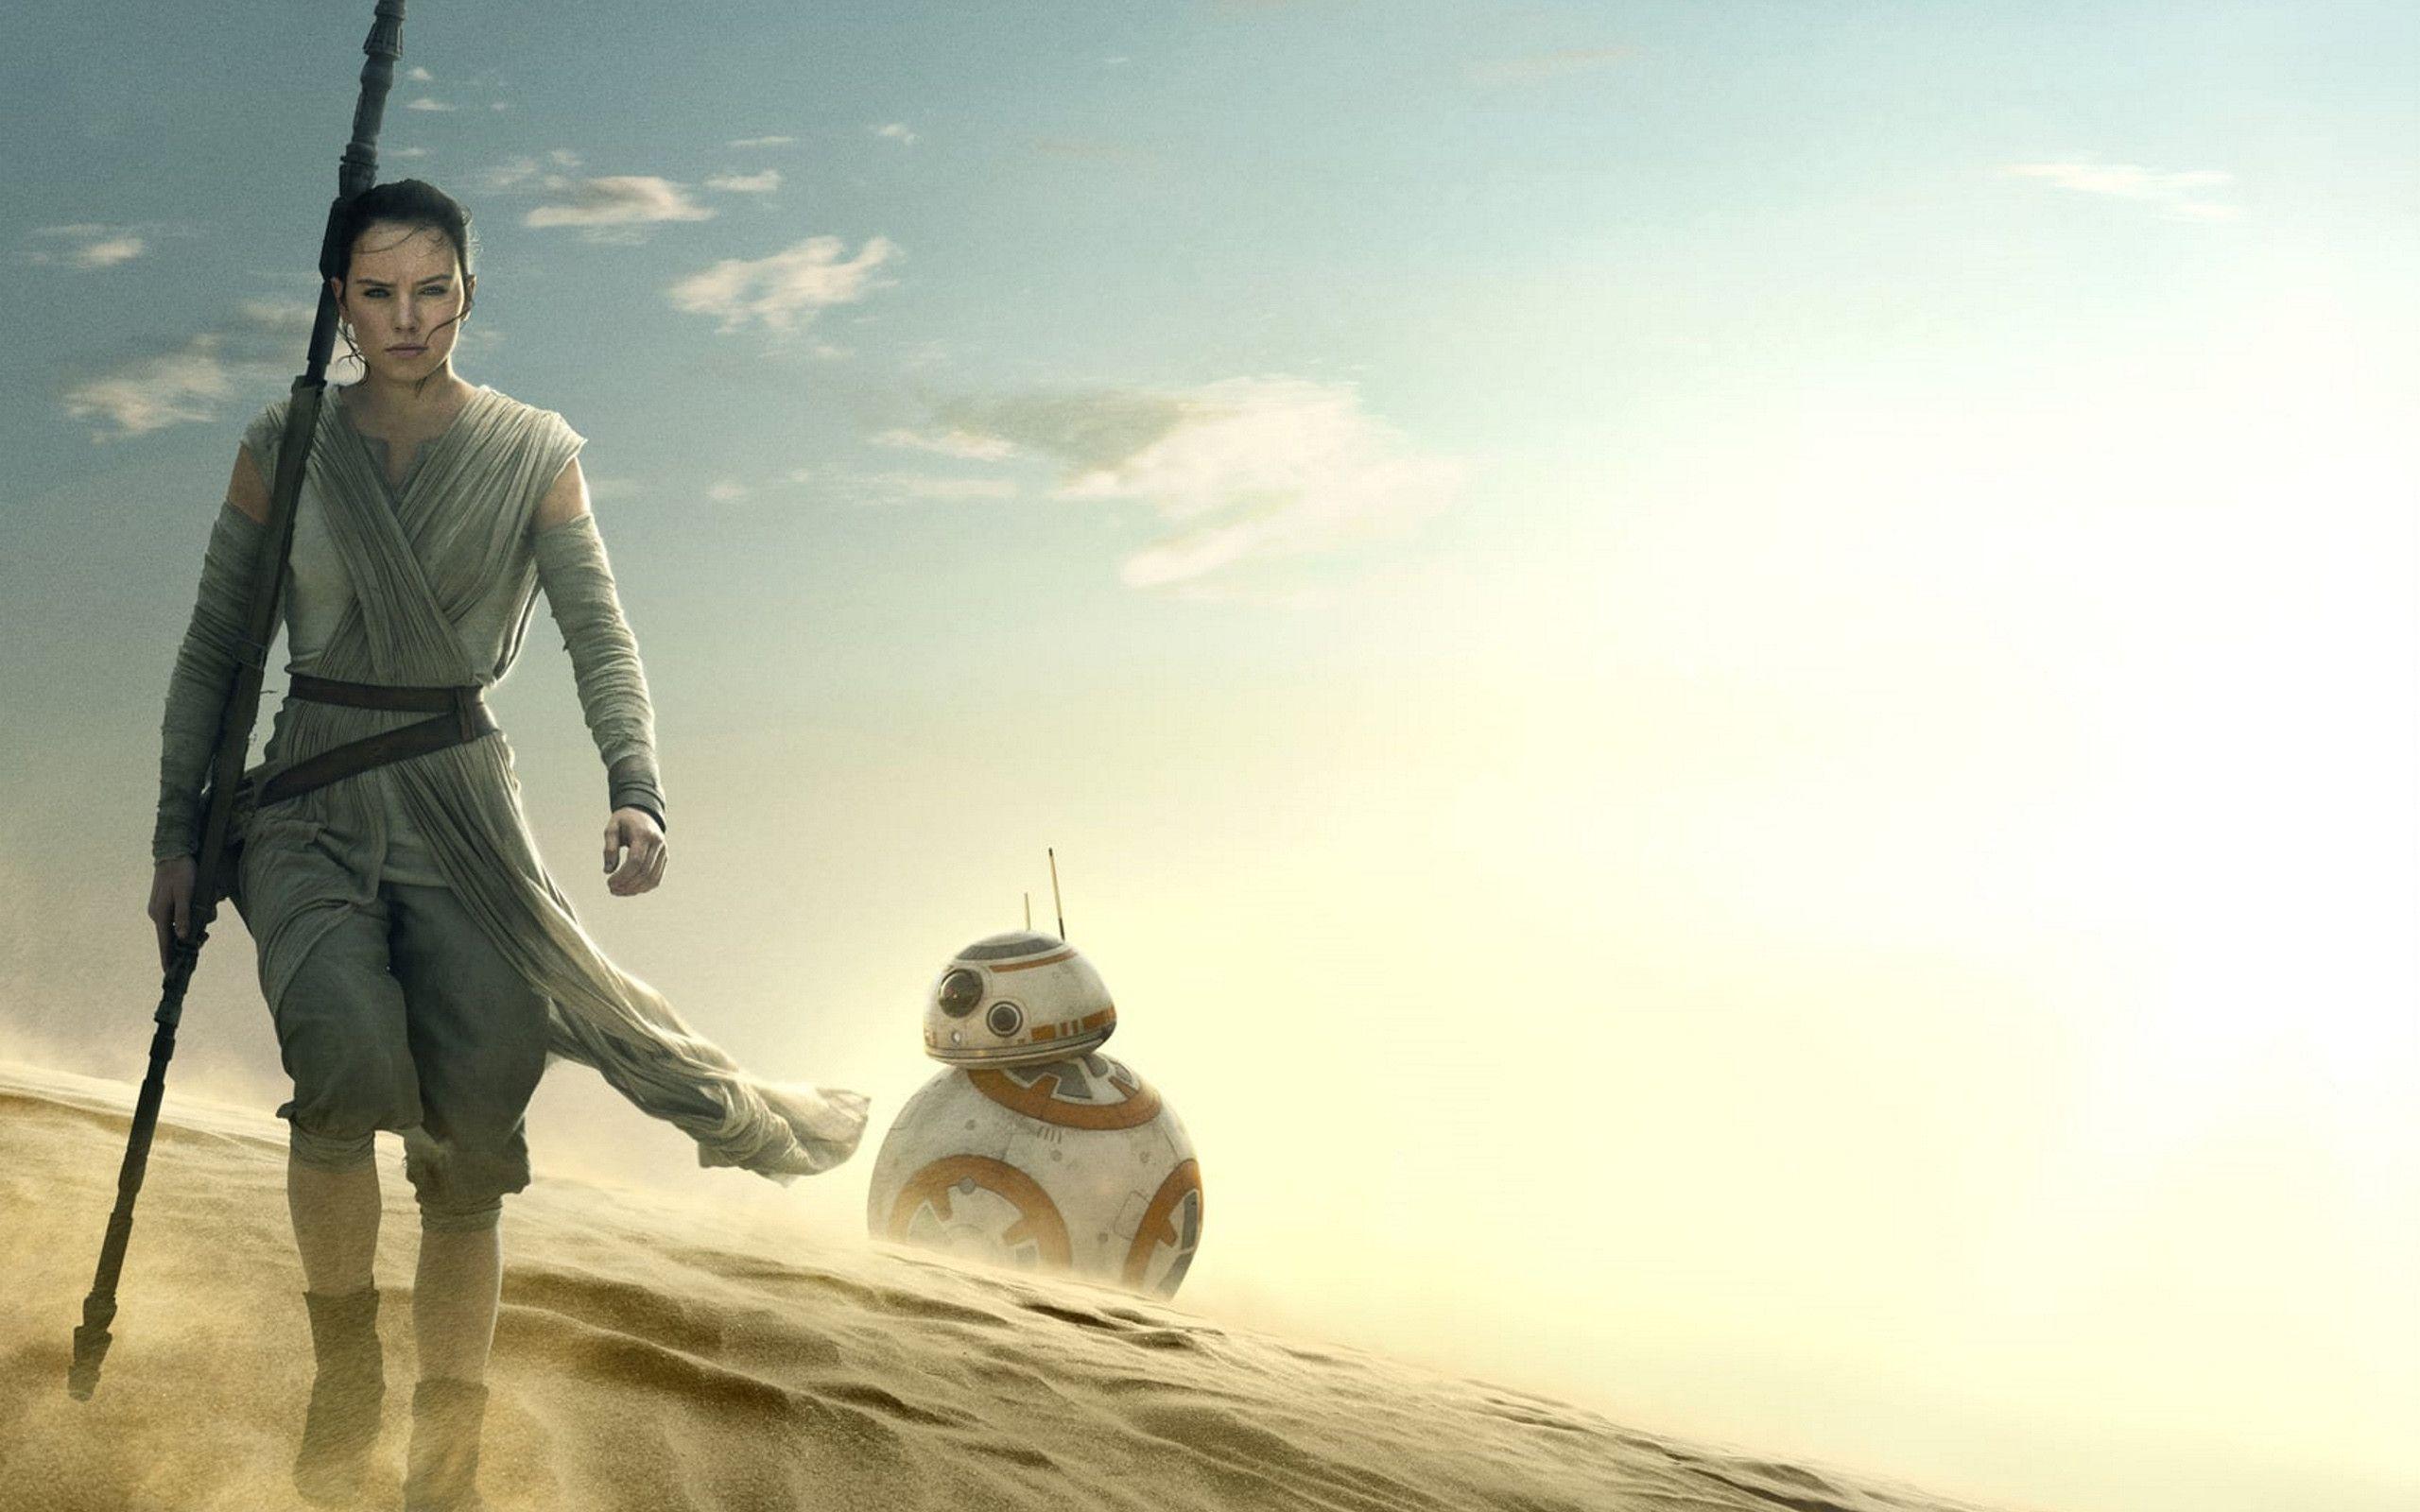 Rey Star Wars Wallpapers High Resolution Rey Star Wars Star Wars Wallpaper Star Wars